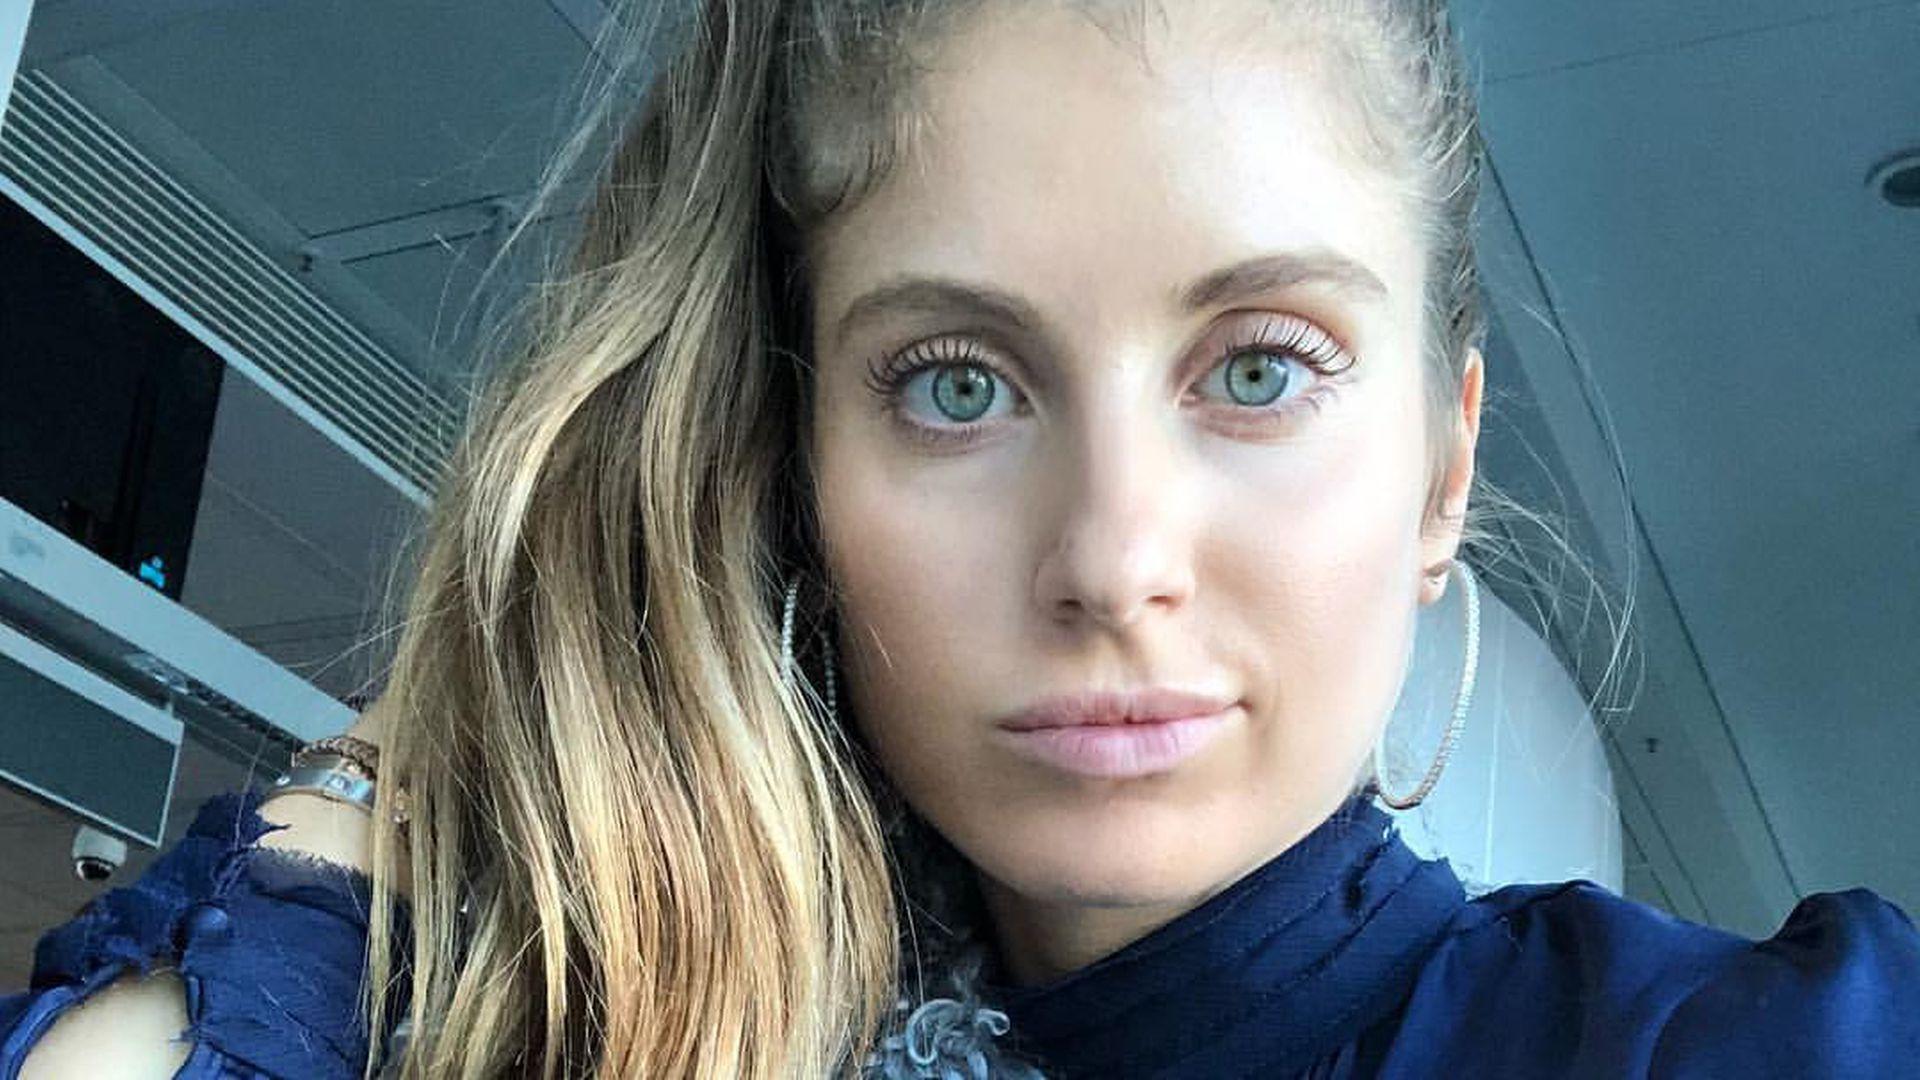 Cathy Hummels Haare Seit Ludwigs Geburt Total Verändert